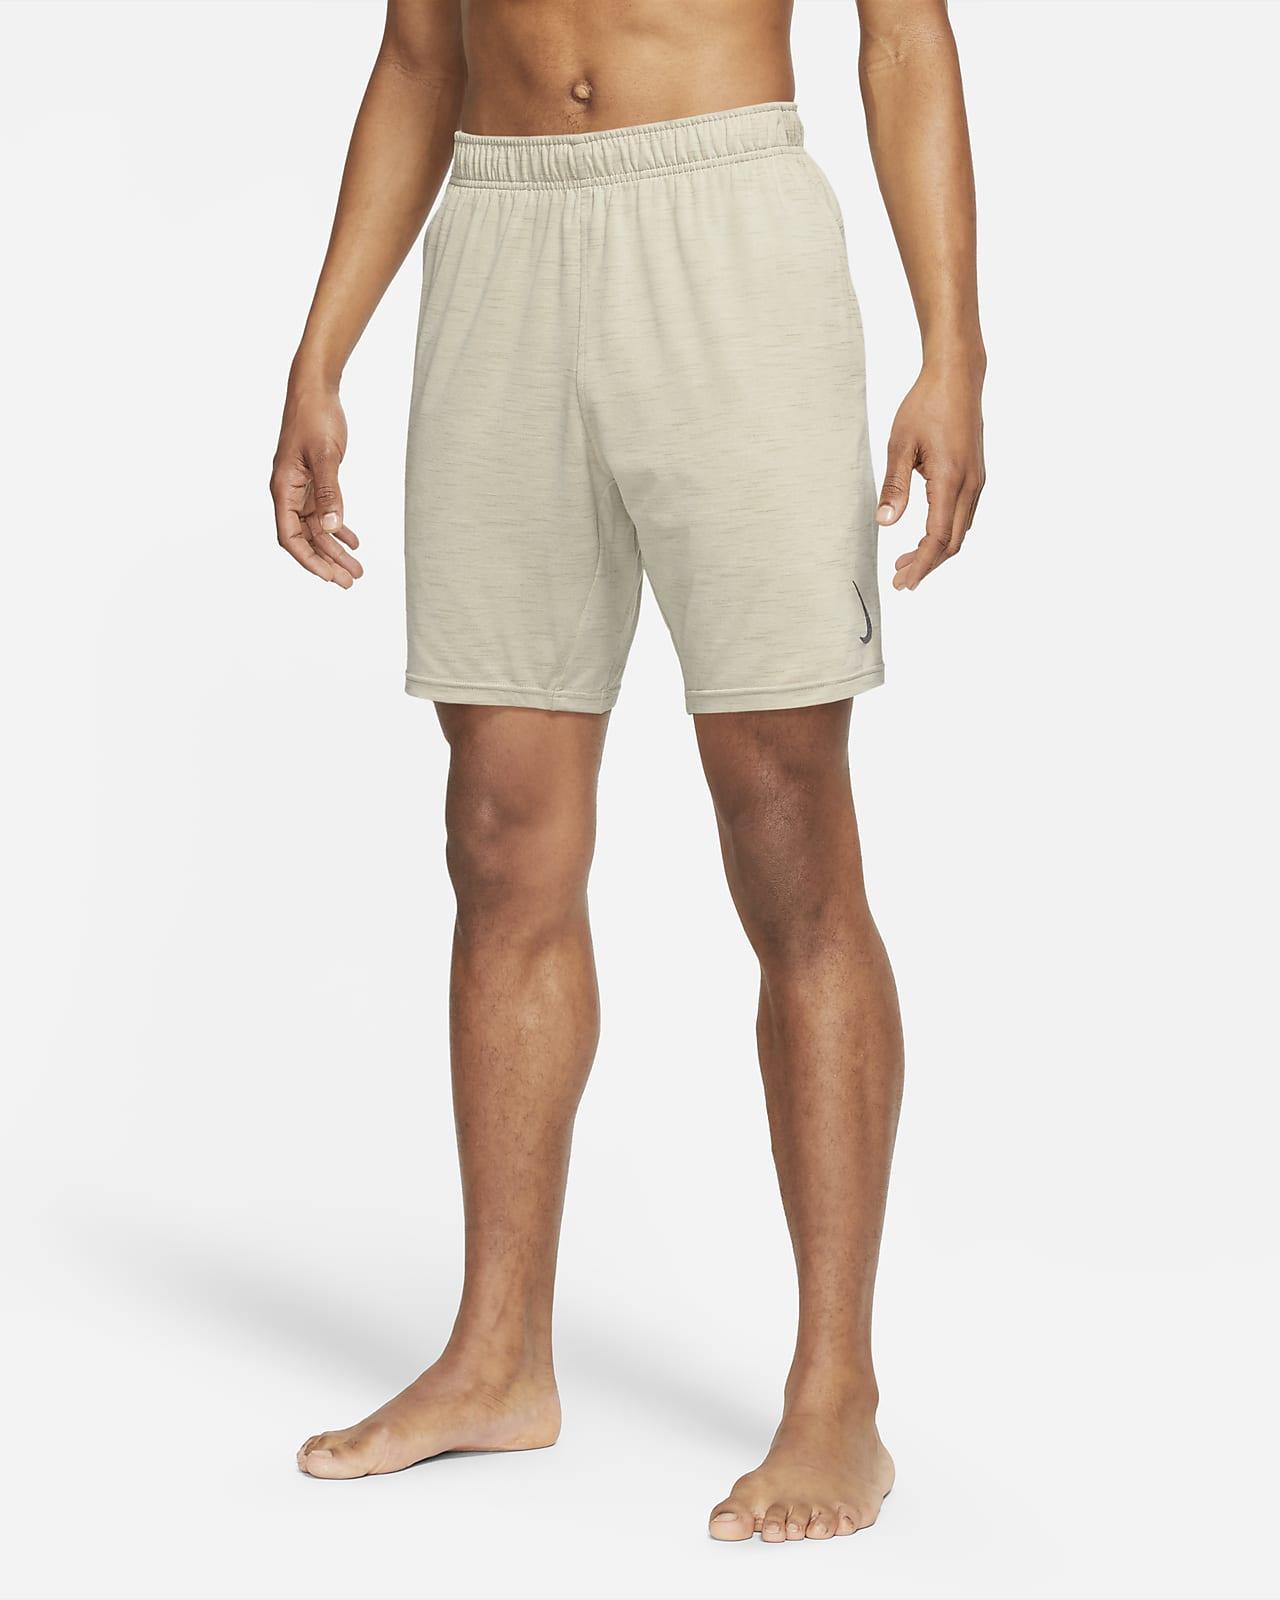 Мужские шорты Nike Yoga Dri-FIT